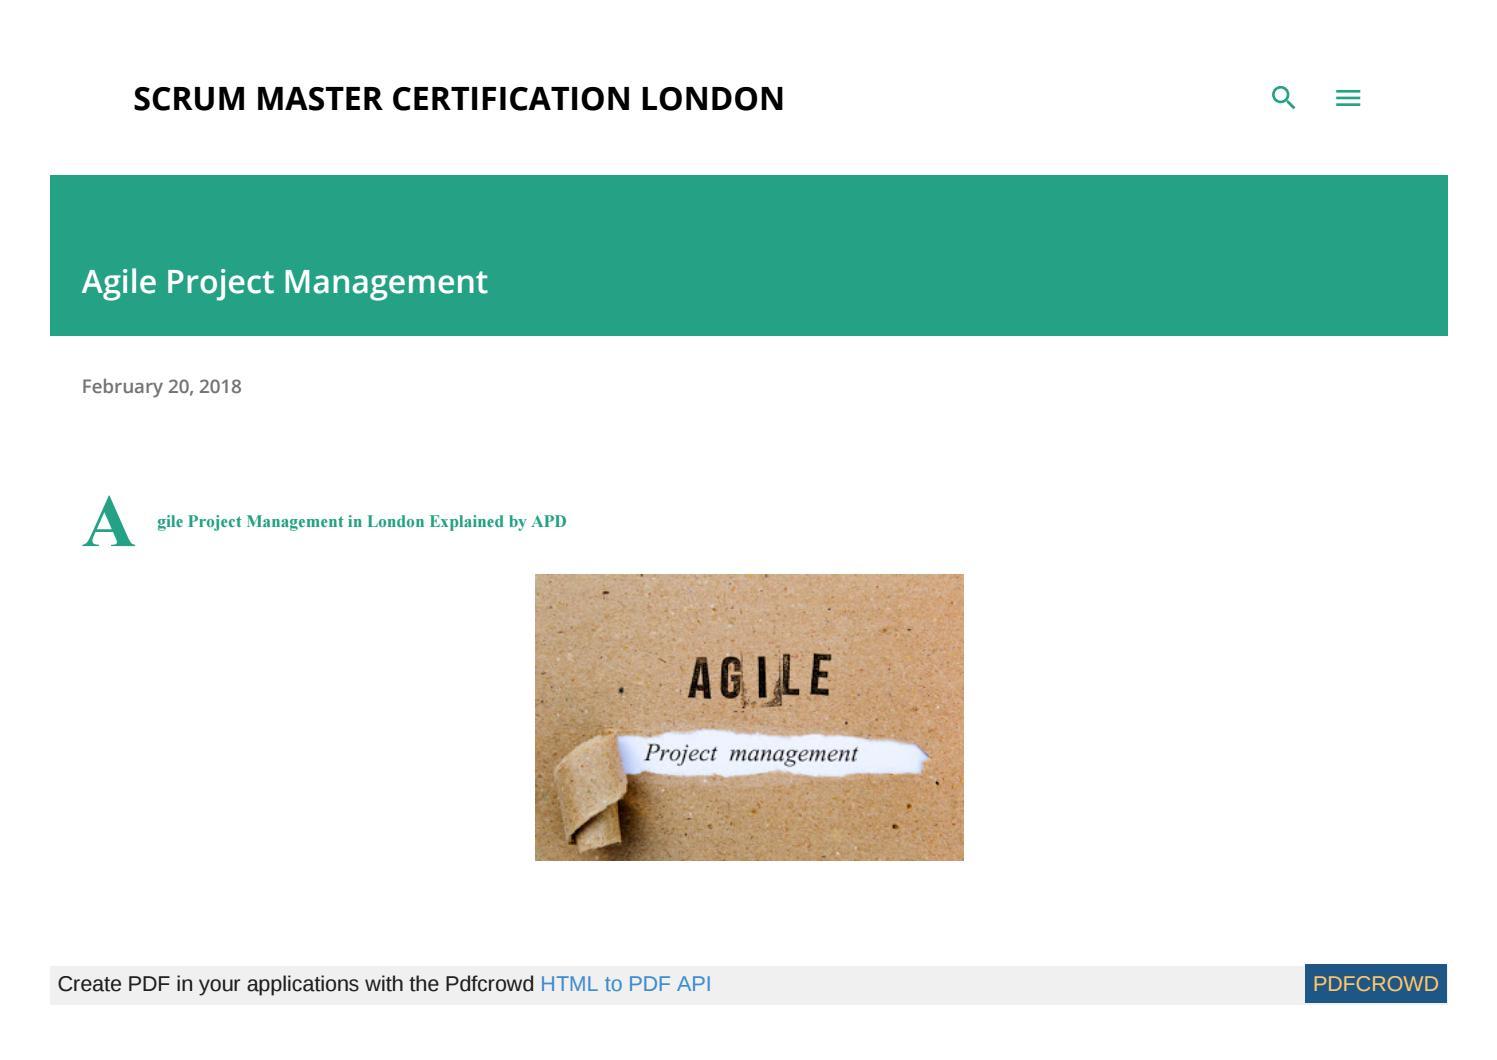 Agile Scrum Project Management Certification agile scrum project management londonadvanced product